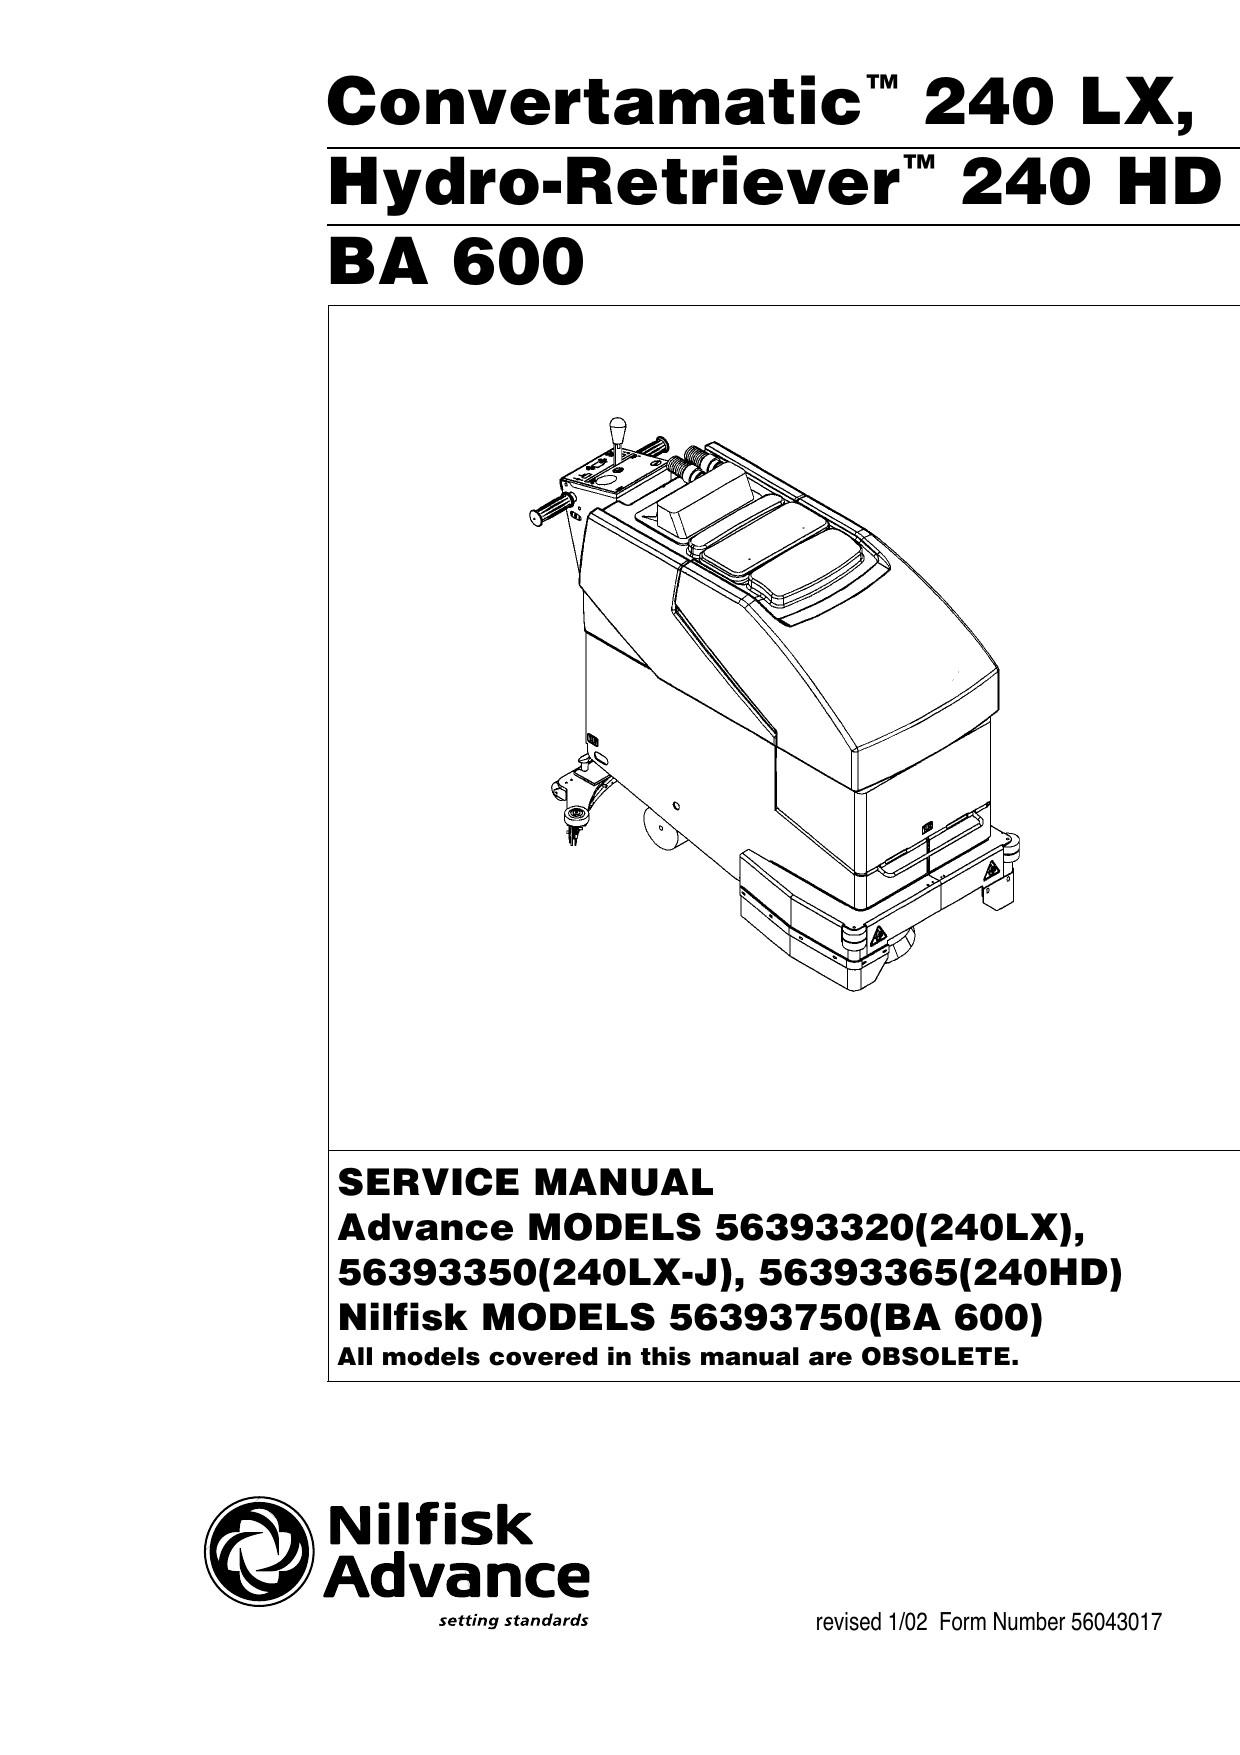 Hydro Vac Schematic Convertamatic™ 240 Lx Hydro Of Hydro Vac Schematic